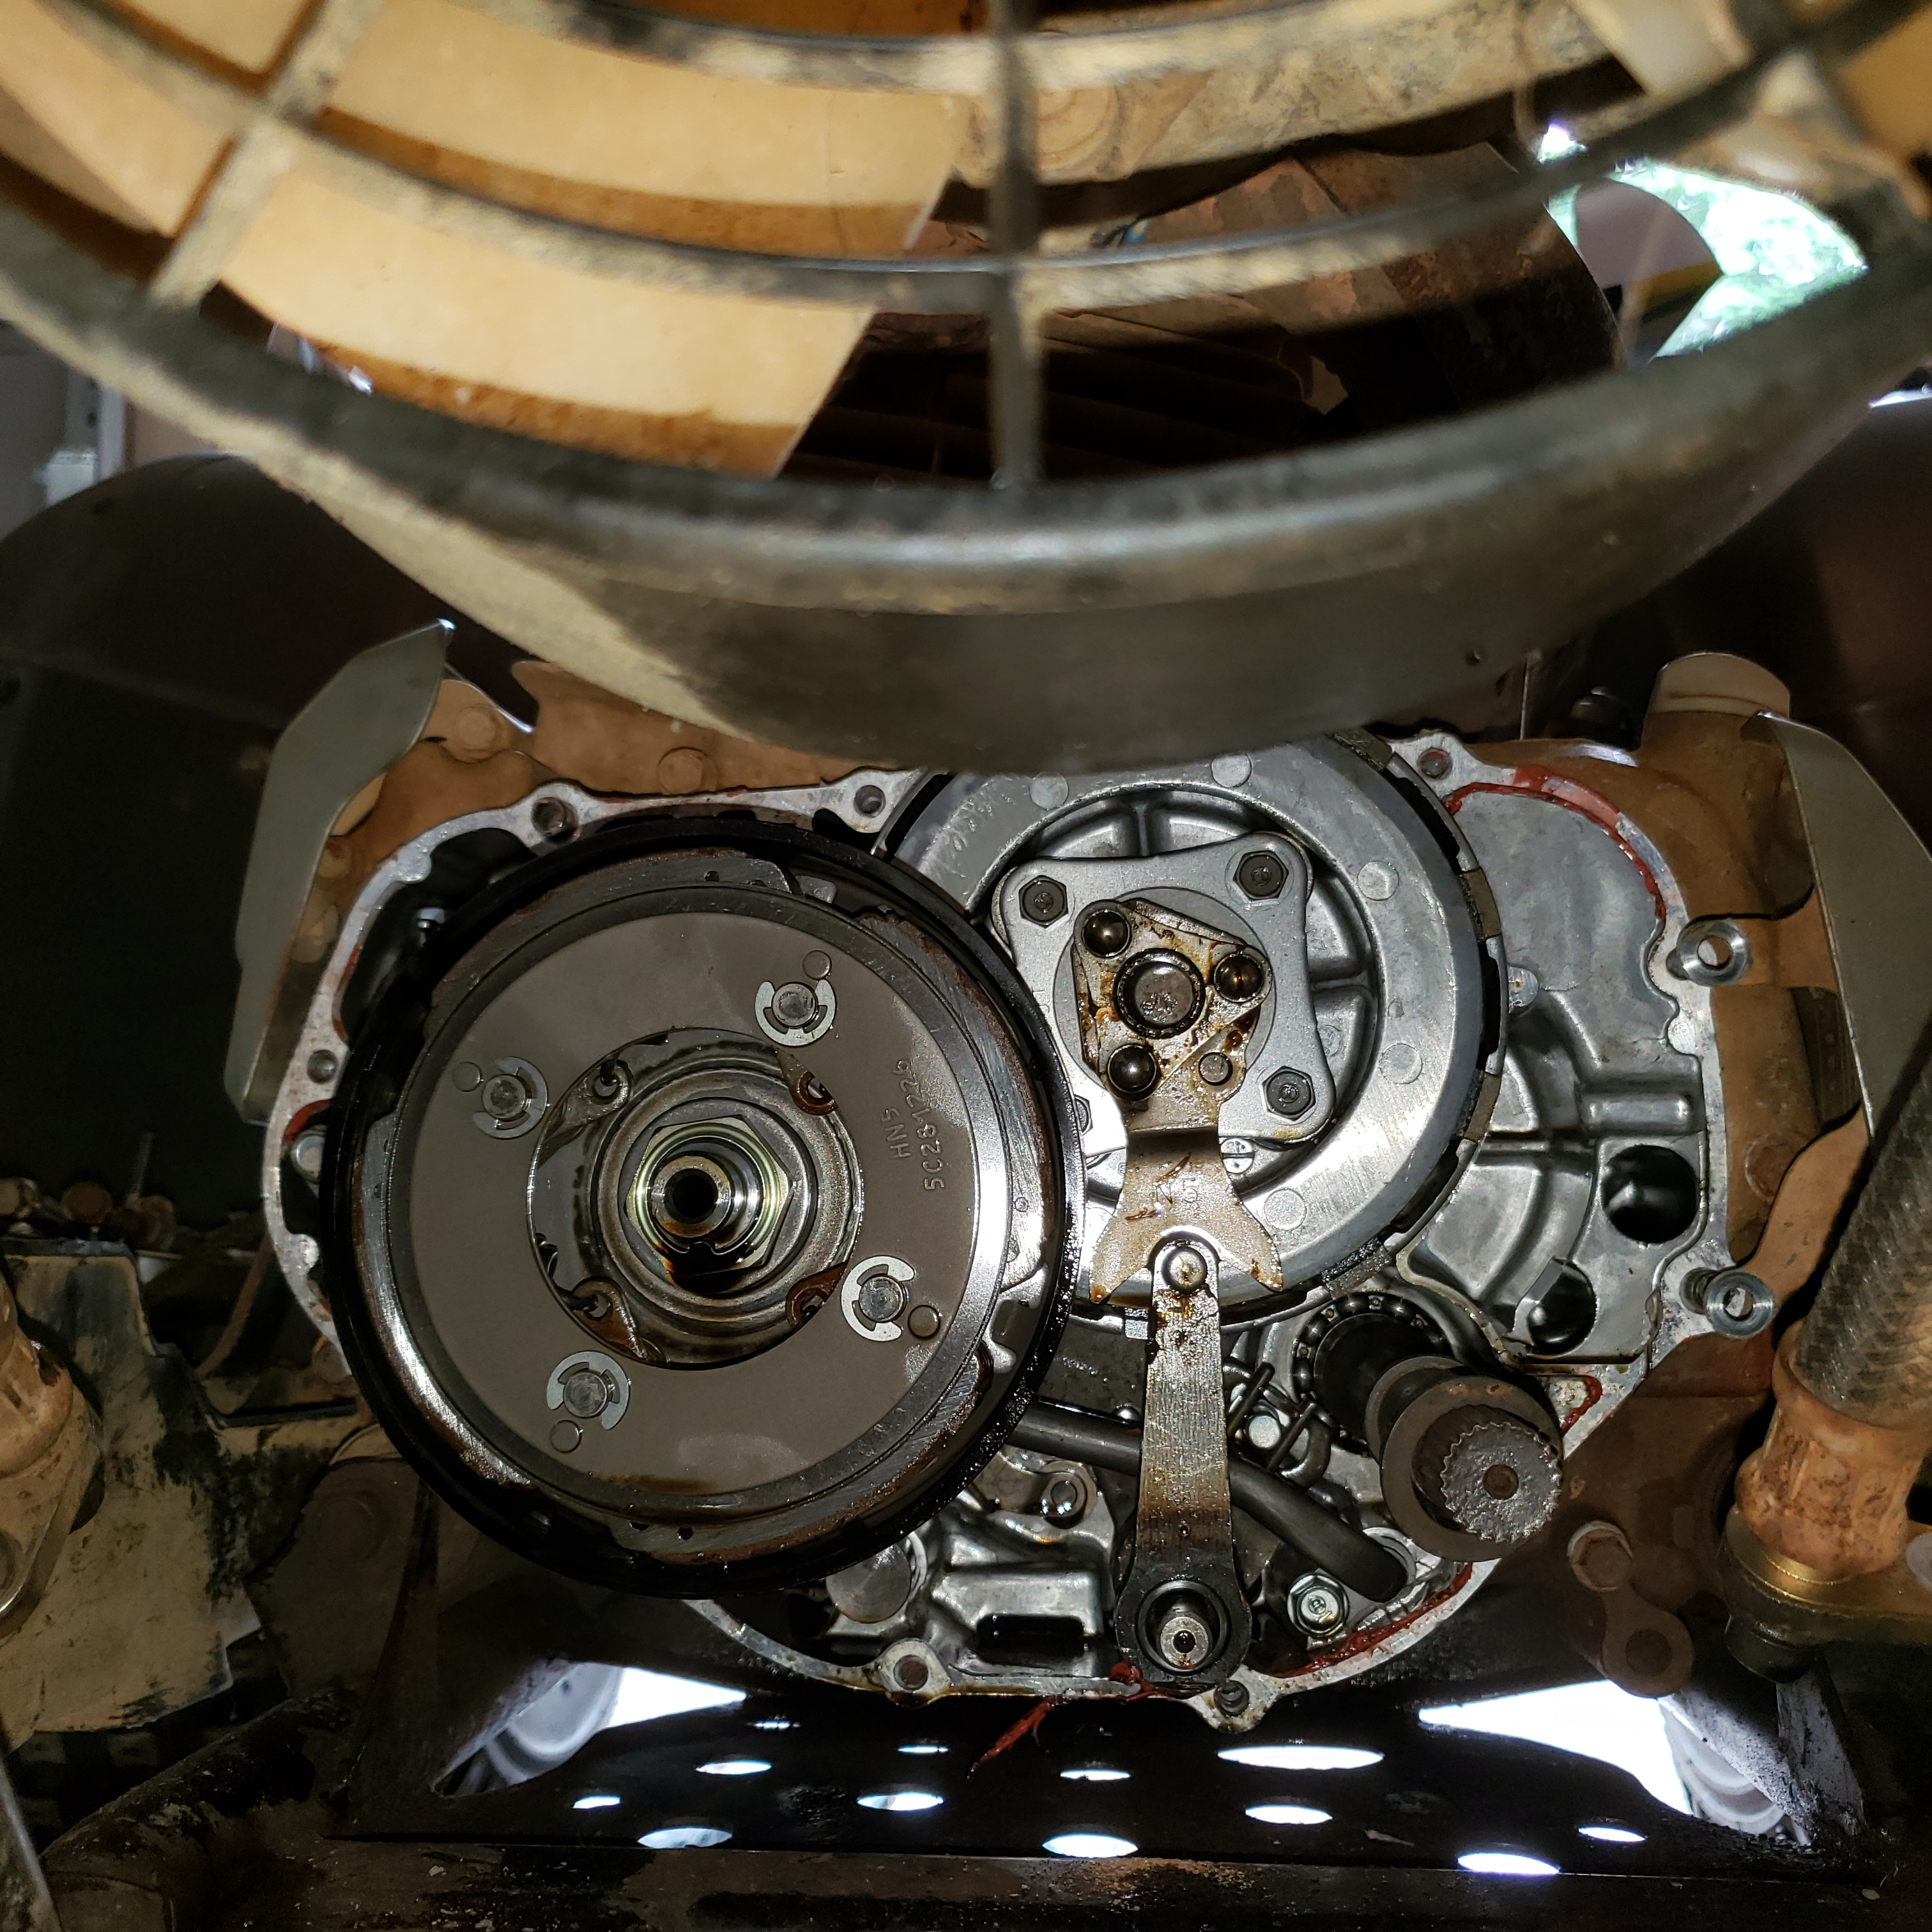 2005 Honda rancher 350 4x4 front drive shaft help-20190502_130606_1556869051548.jpg